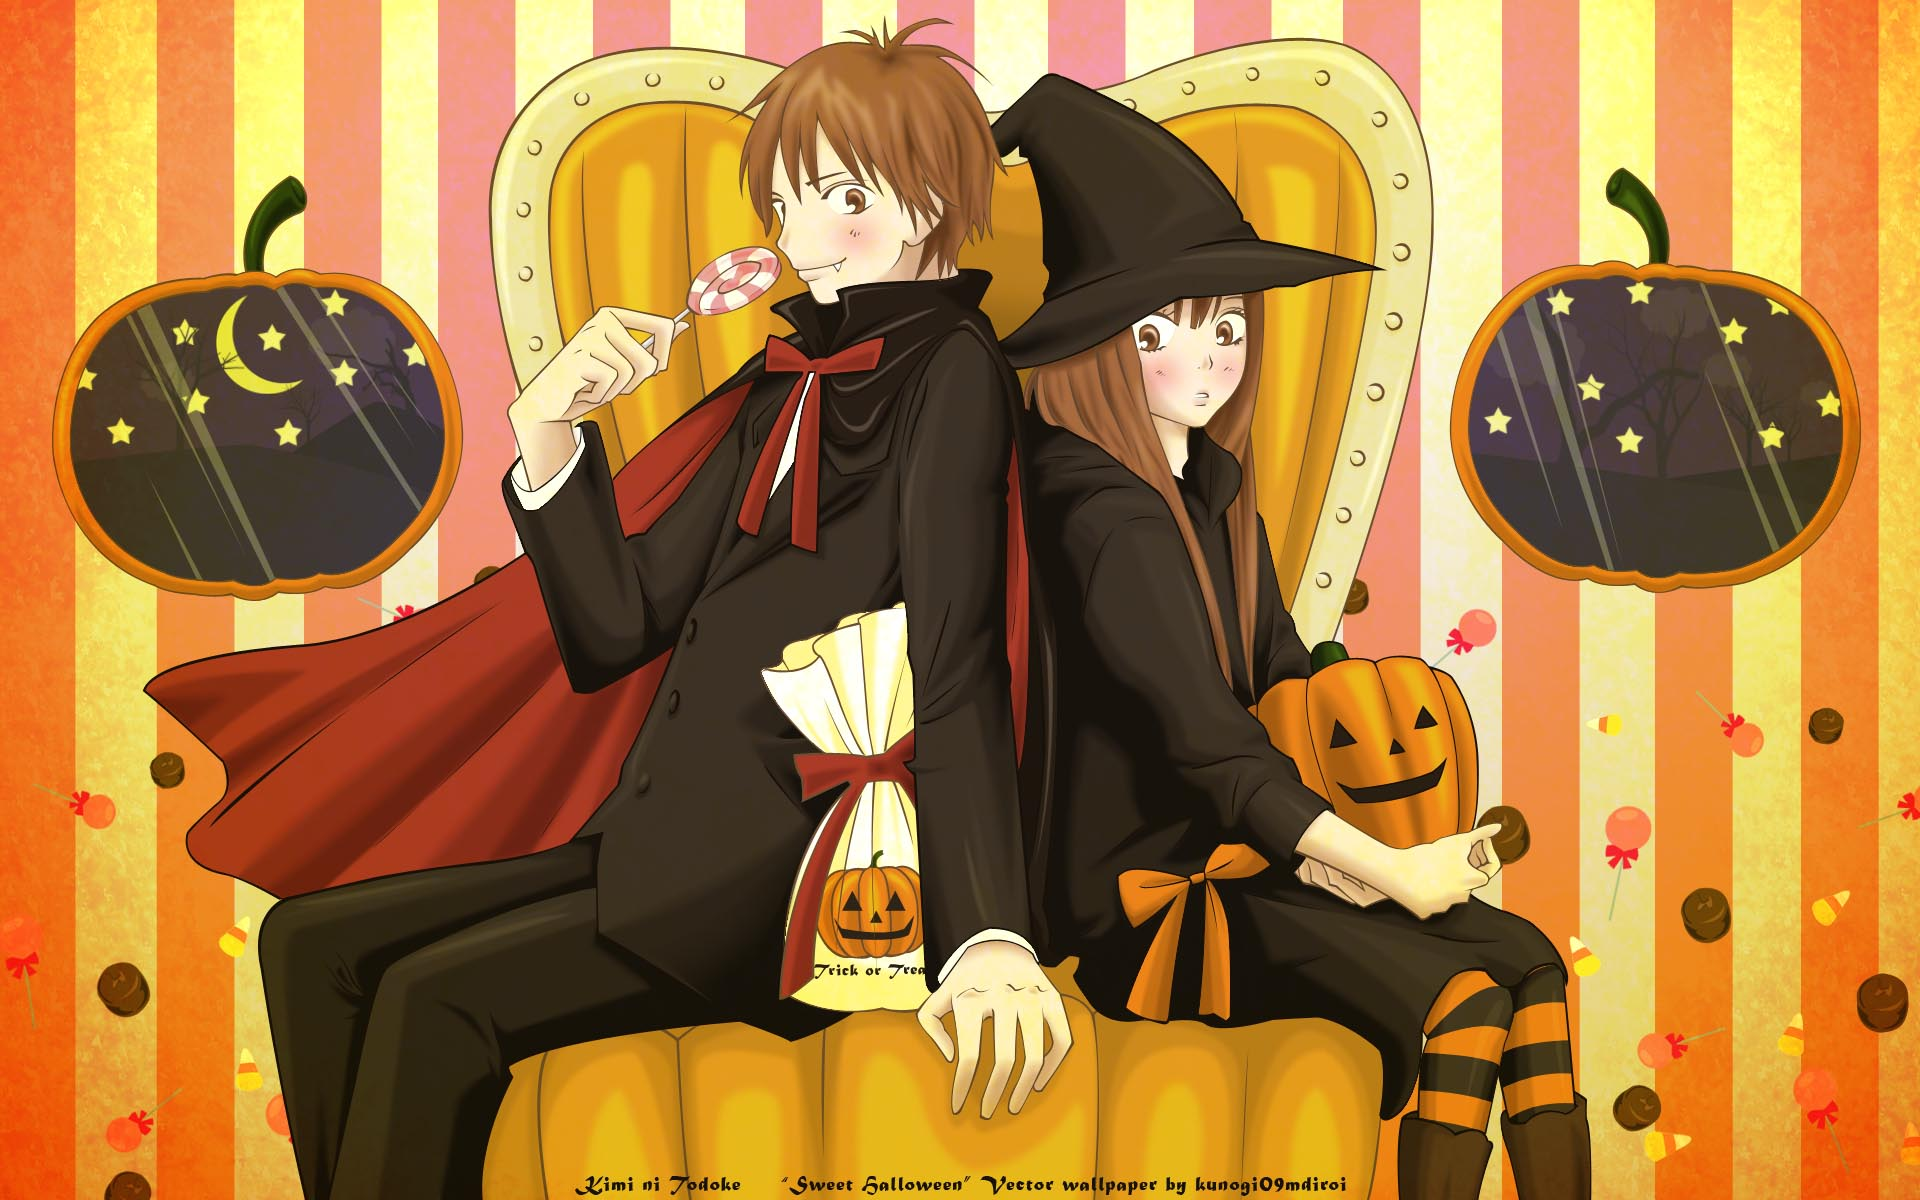 Picture from Kimi Ni Todoke, one of my favorite manga.